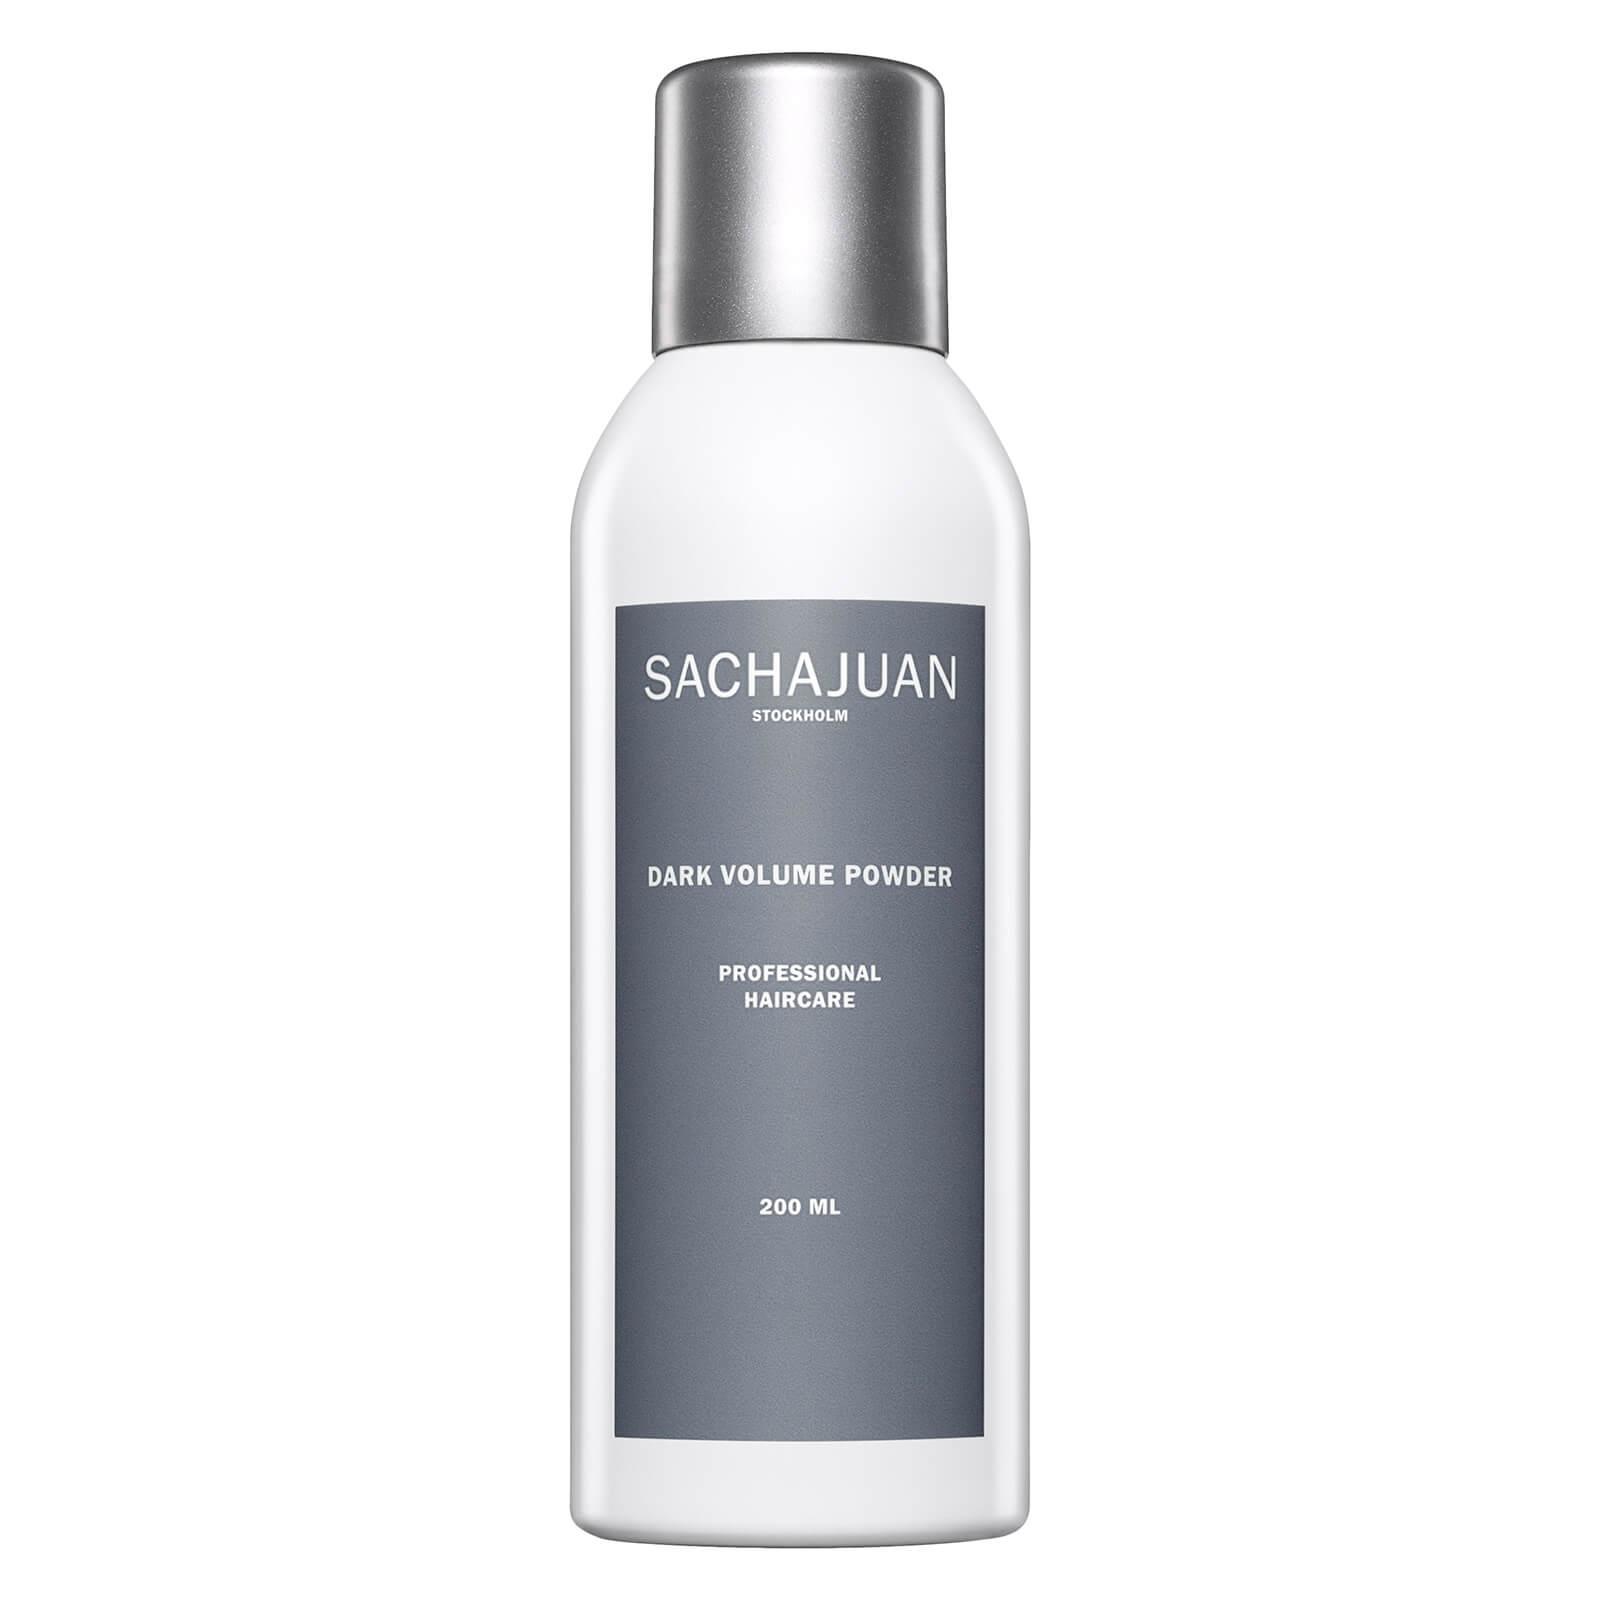 Sachajuan Shampooing sec Volumateur Cheveux Foncés « Dark Volume Powder » Sachajuan 200 ml